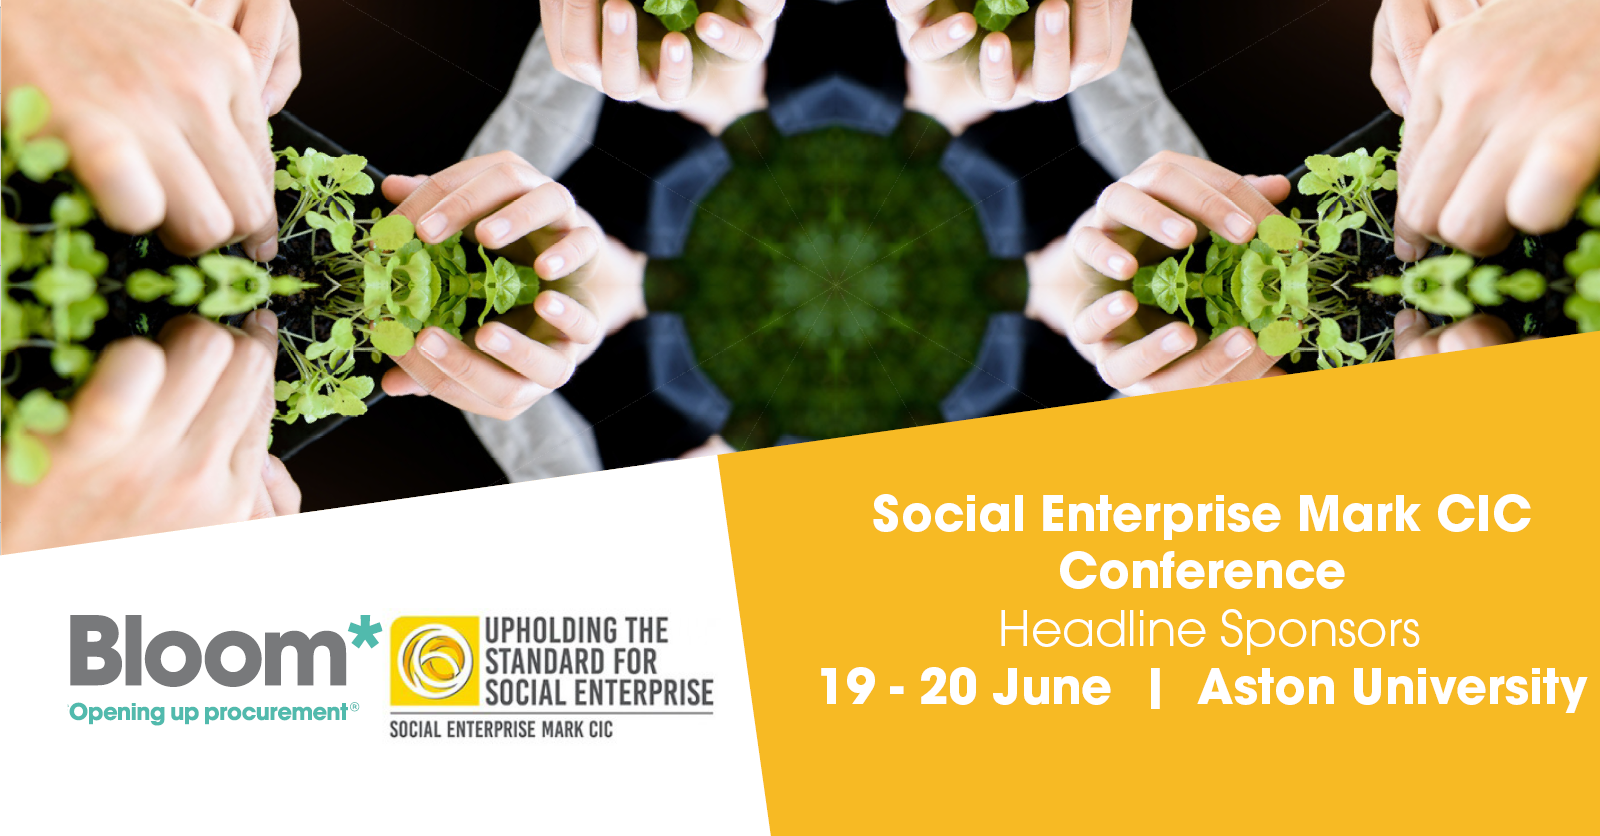 Social Enterprise Mark CIC Conference 2019